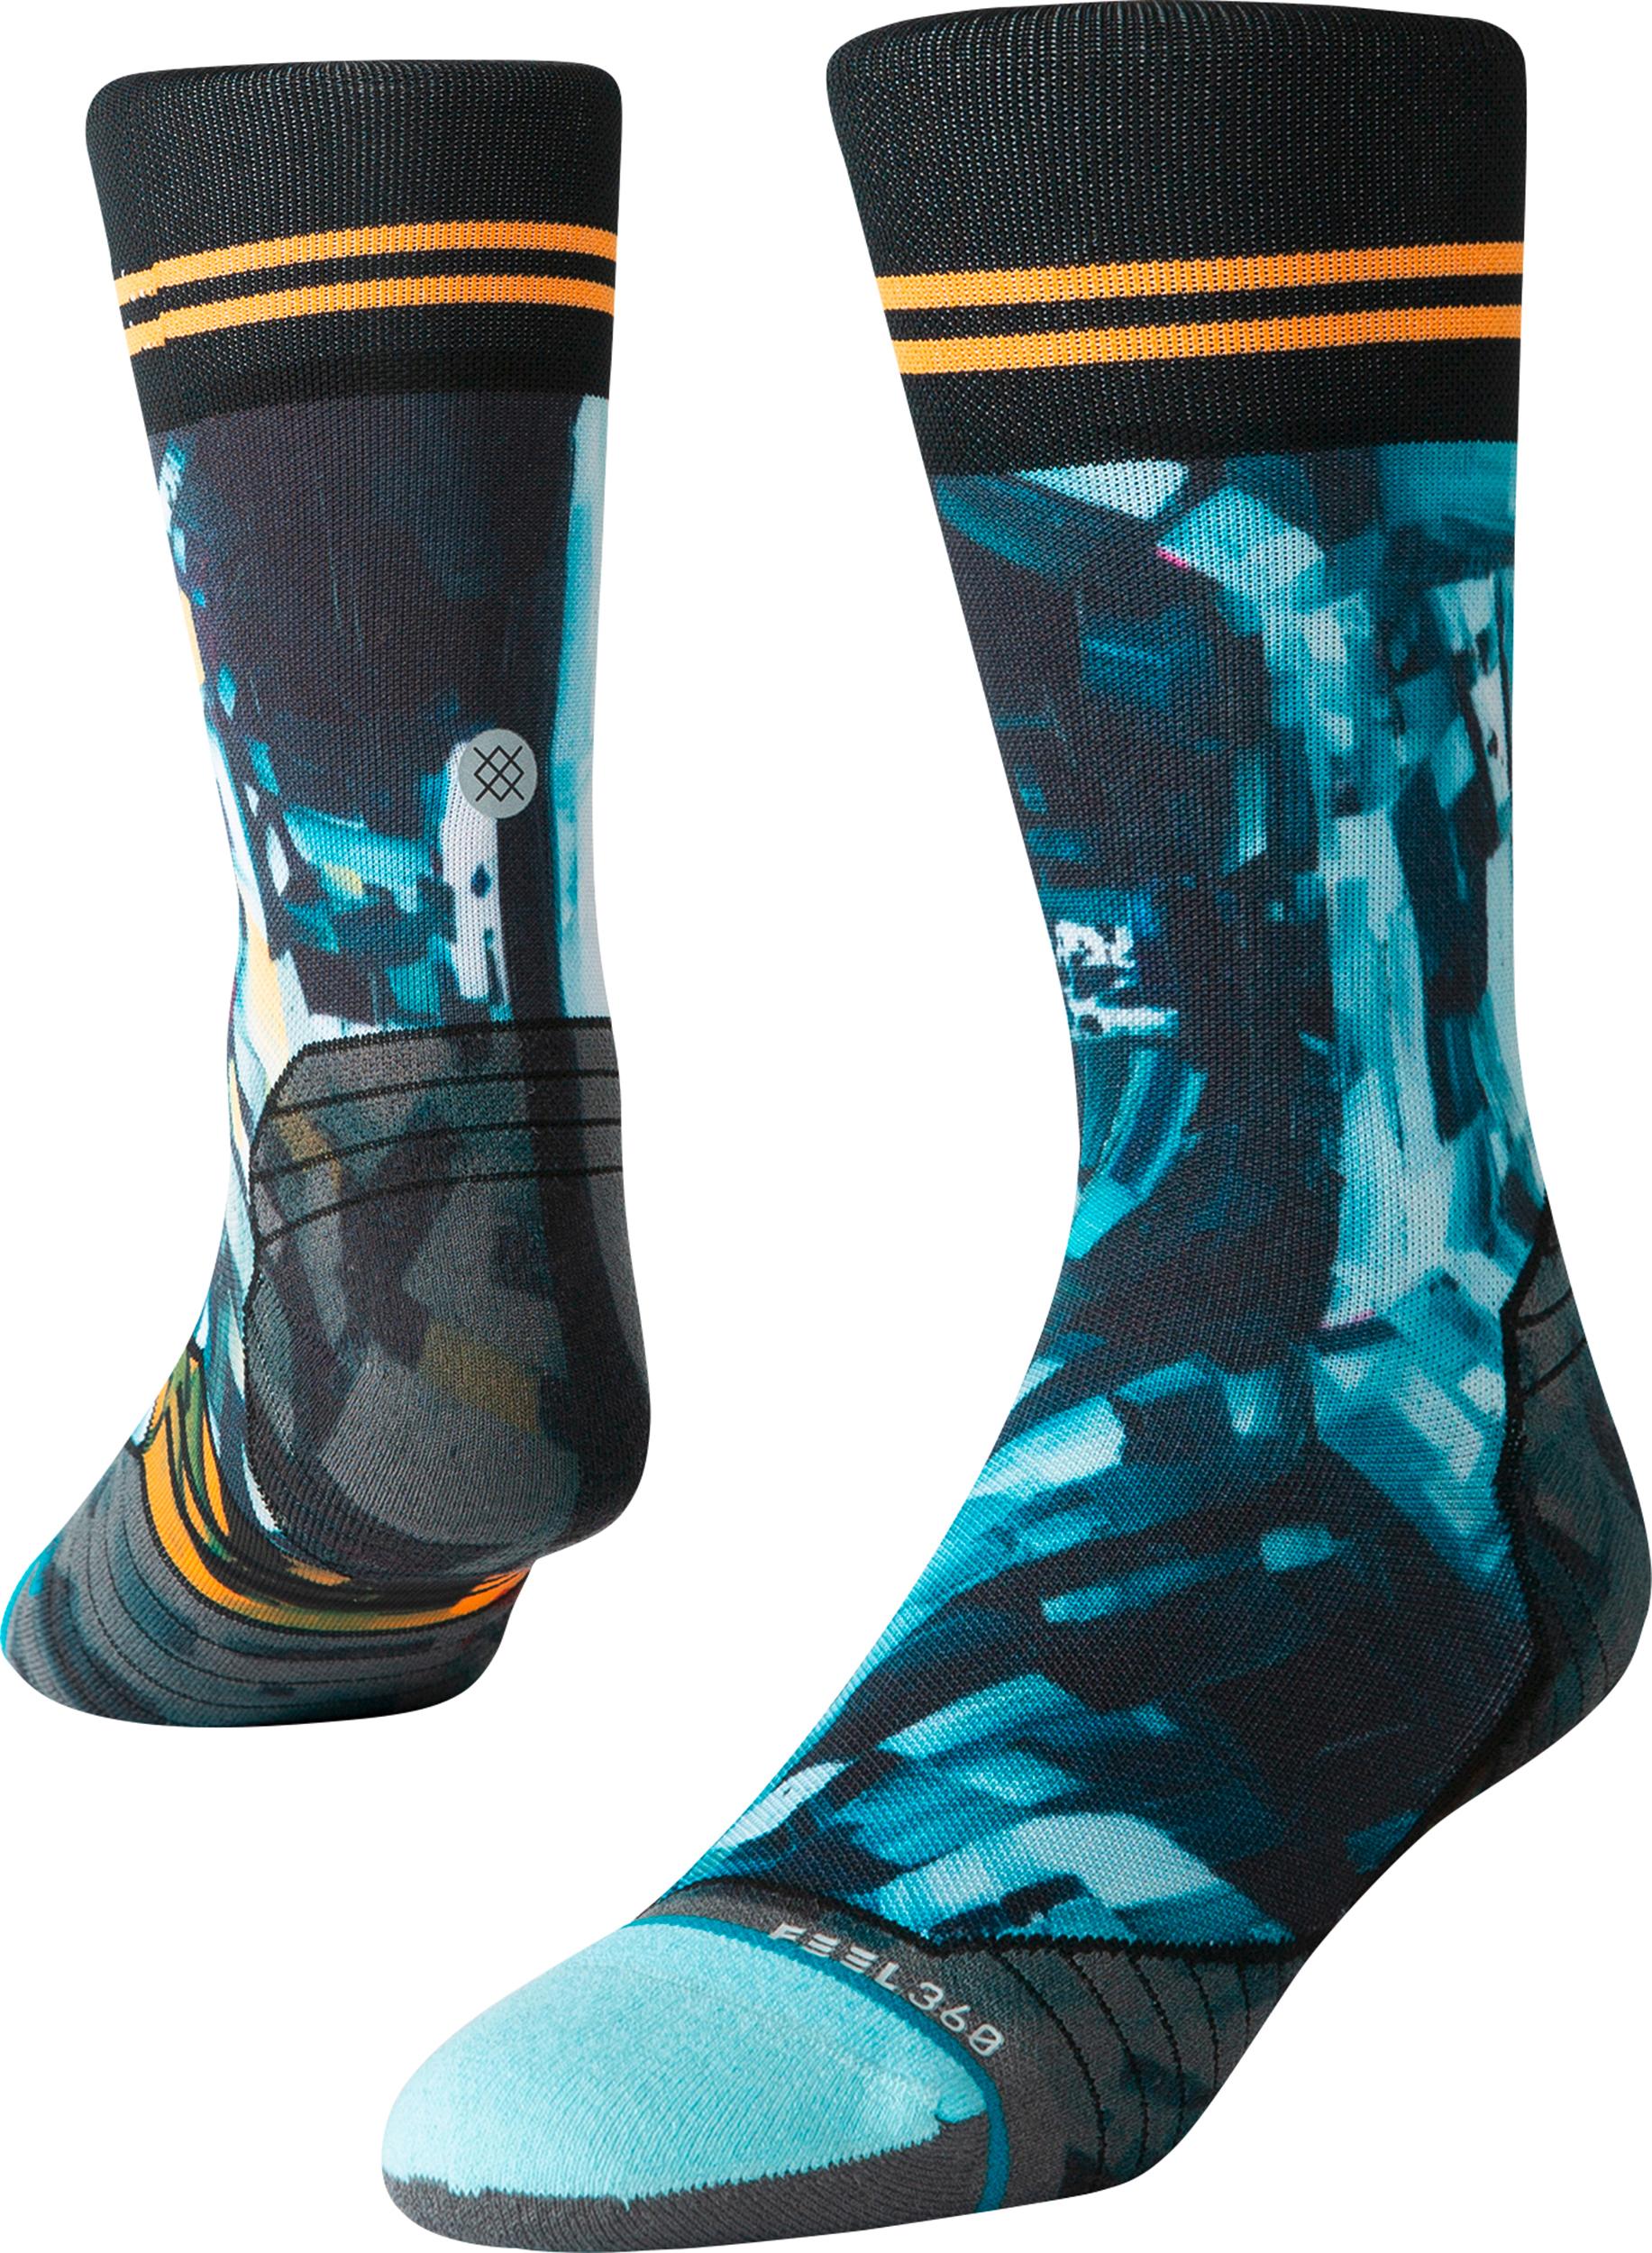 ab101430f72f1 Stance Kagan Moon Man Crew Run Socks - Unisex | MEC